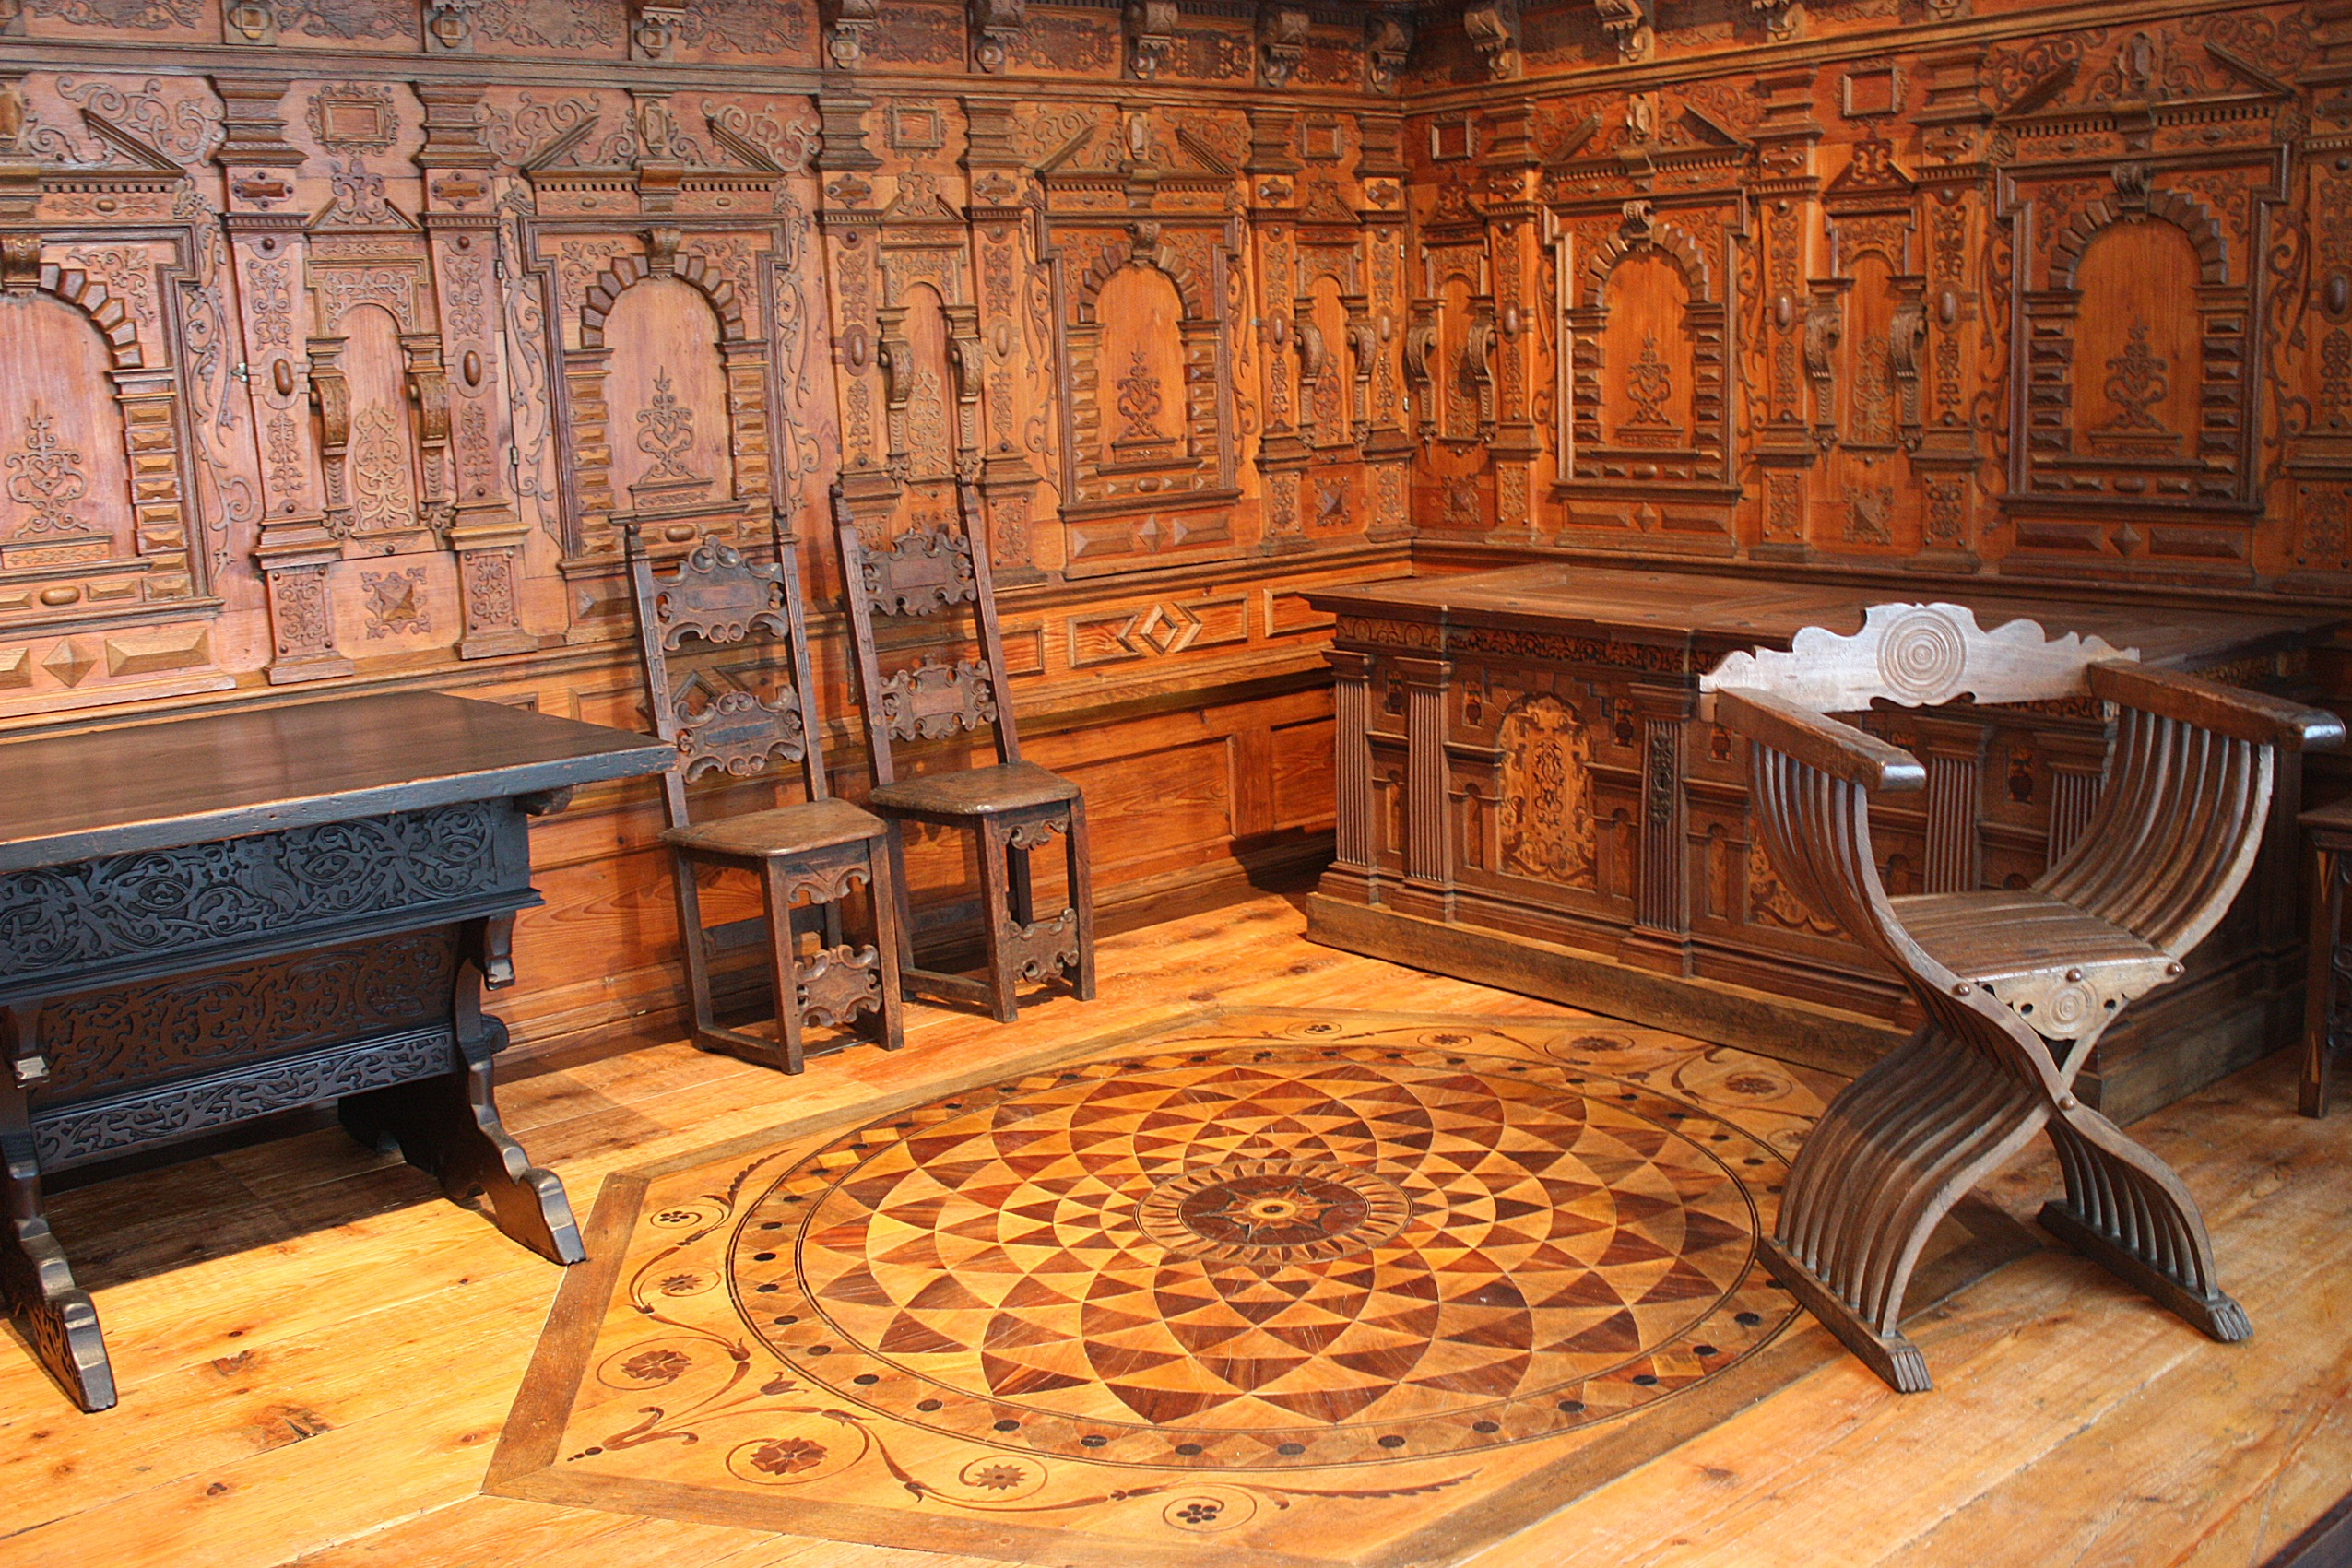 Holzvertäfelung file erfurt angermuseum holzvertäfelung jpg wikimedia commons